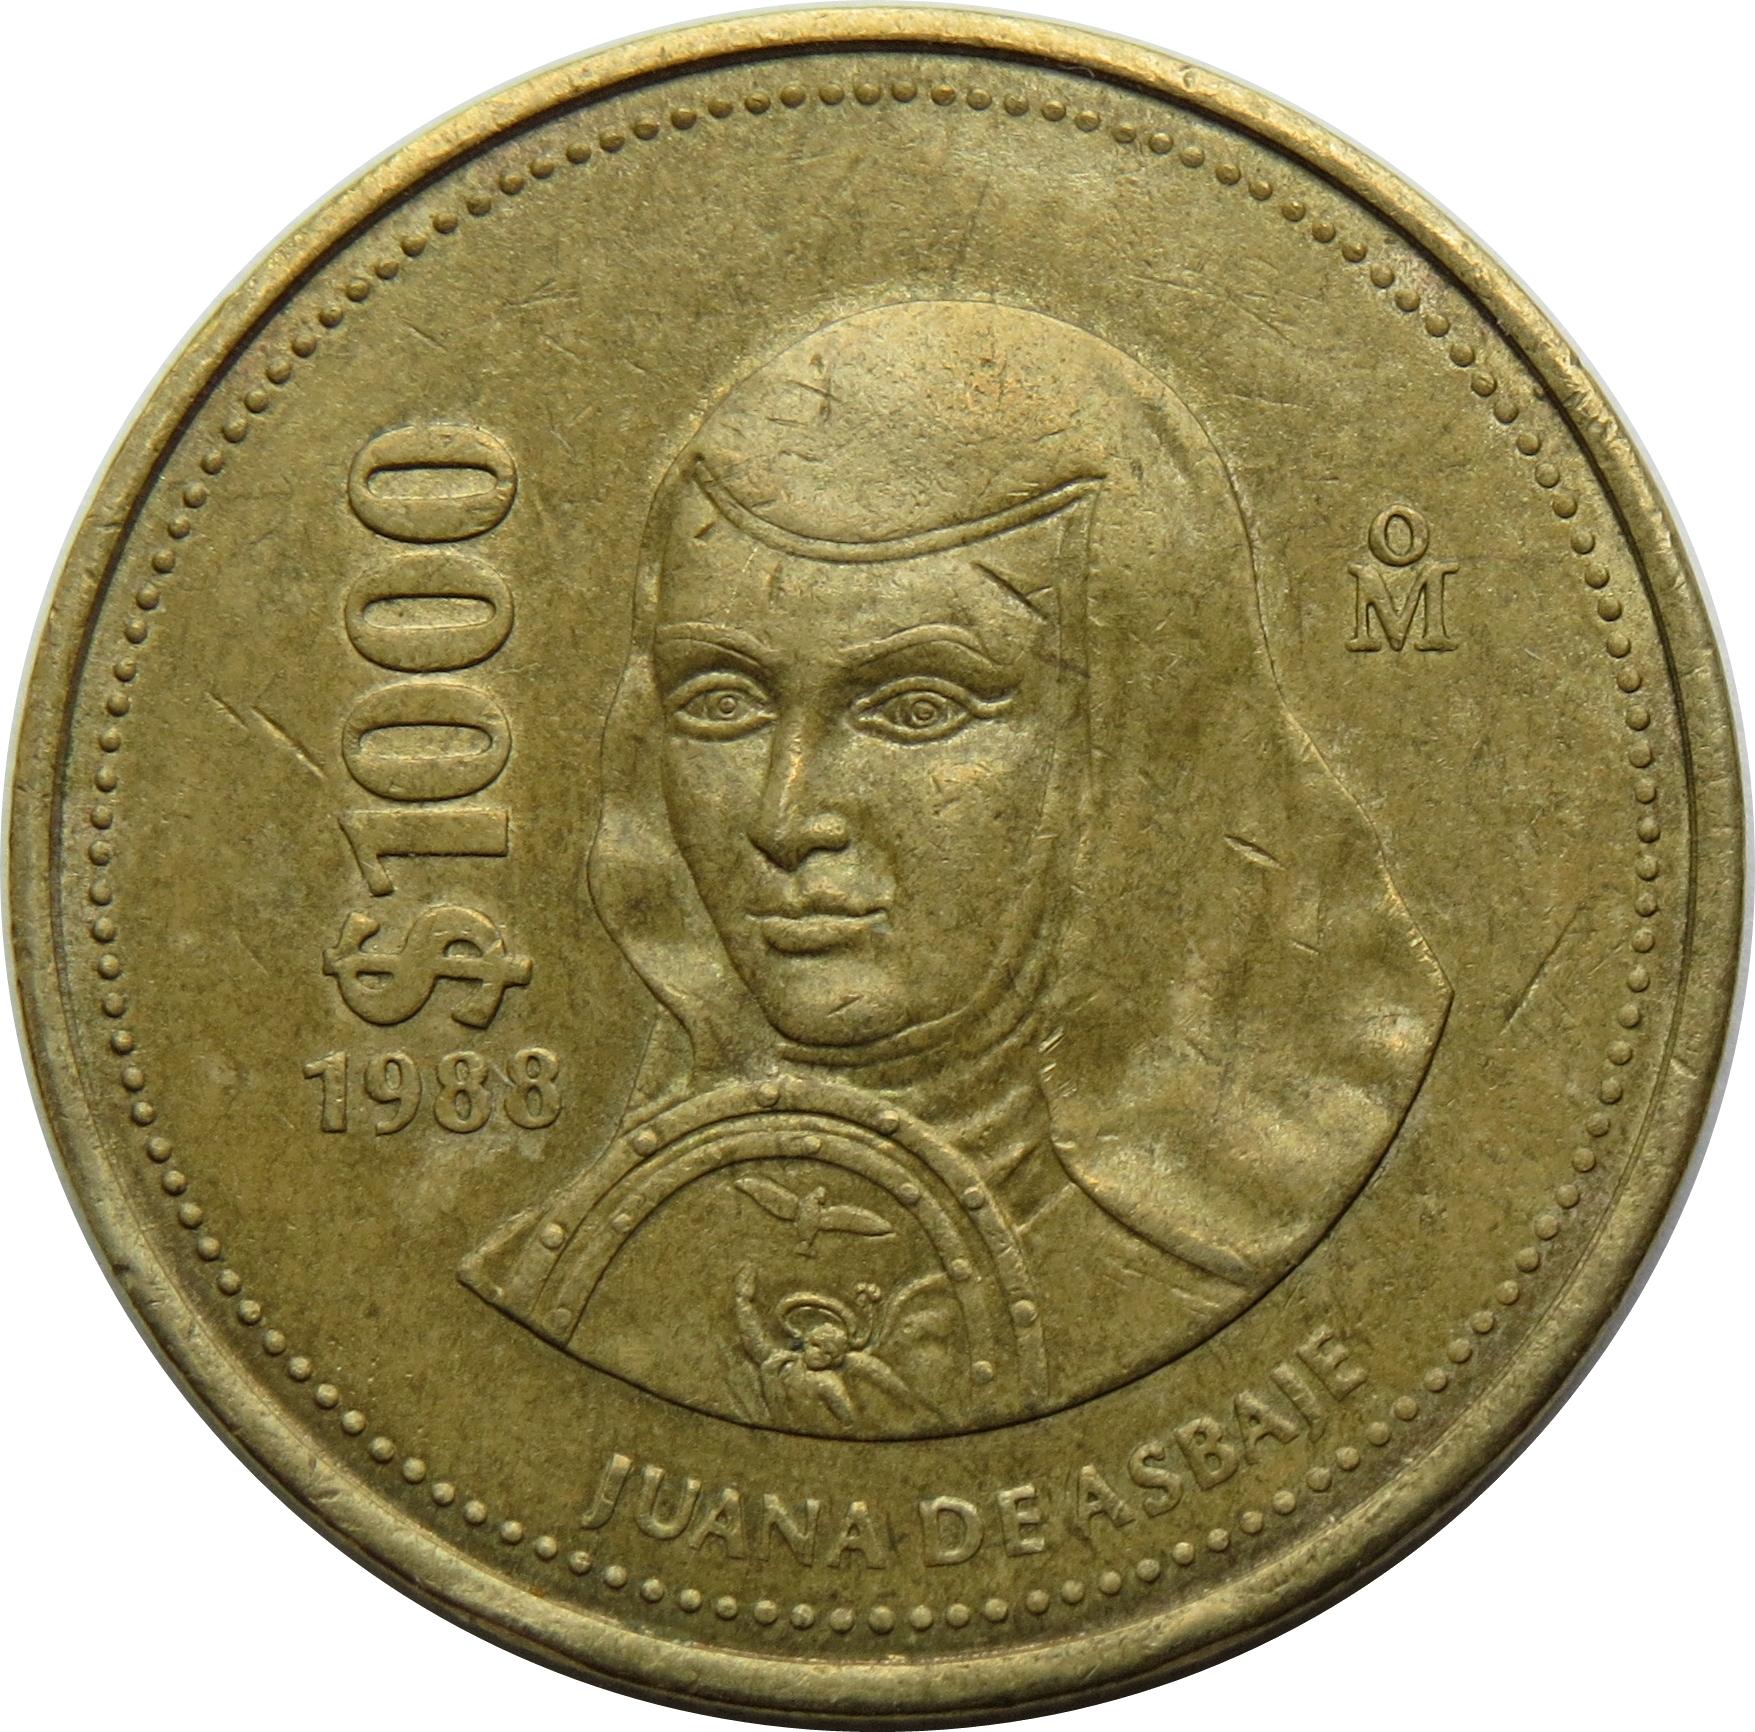 1000 Pesos - Mexico – Numista